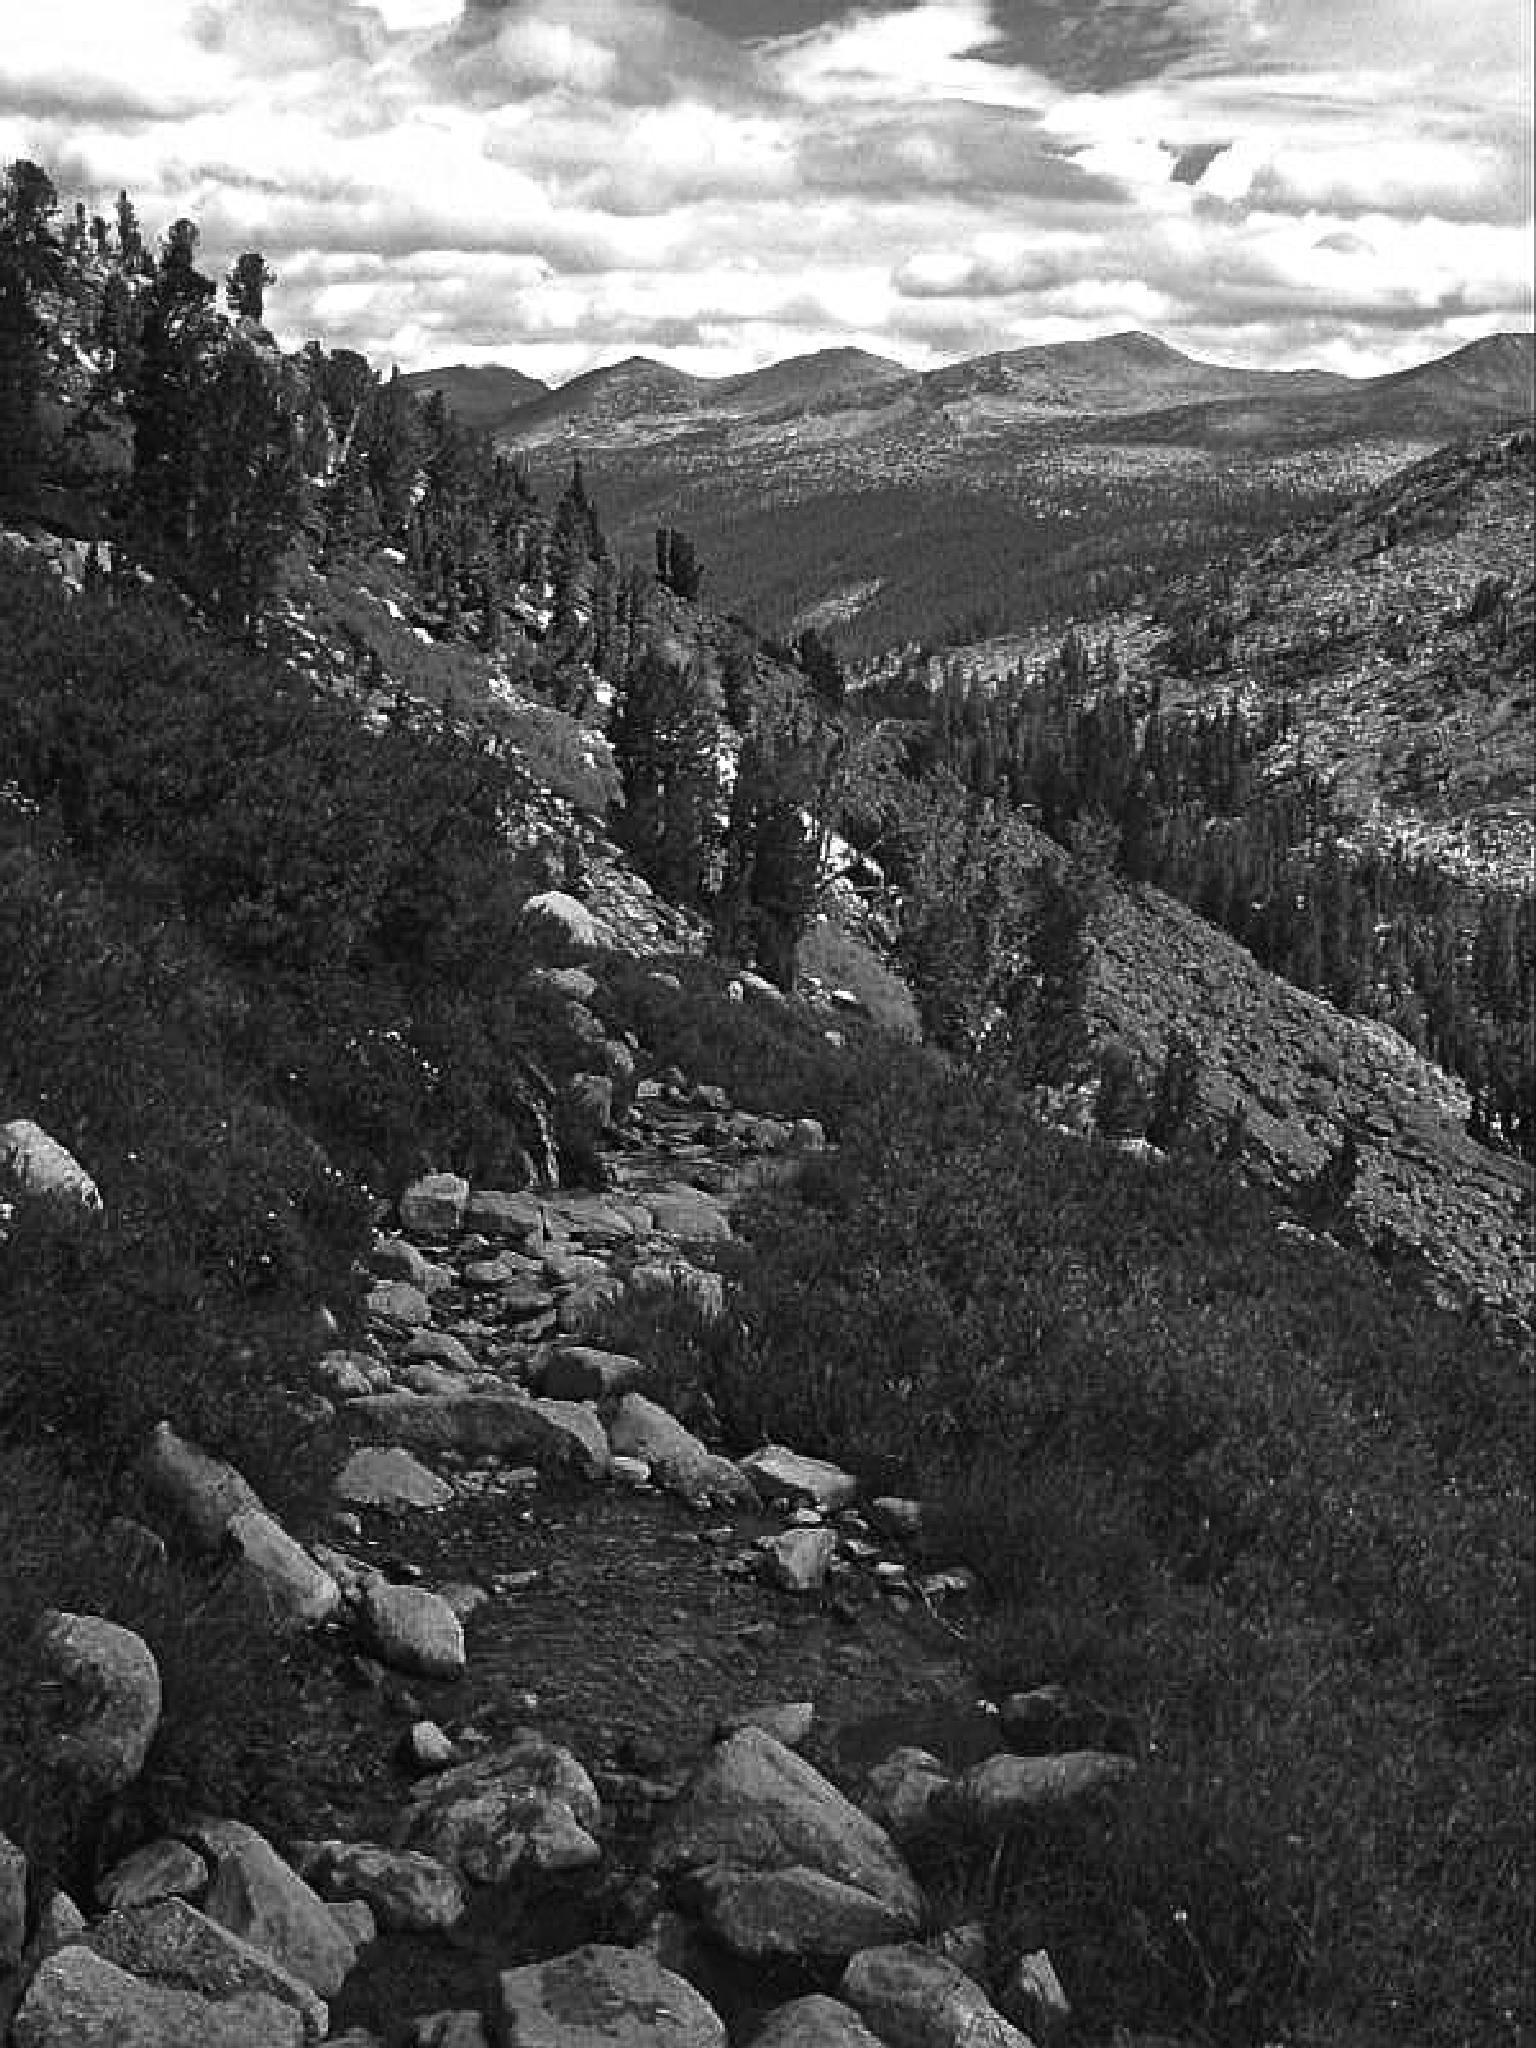 The John Muir Trail in Lyell Canyon, Yosemite by MelanieAnnePhillips